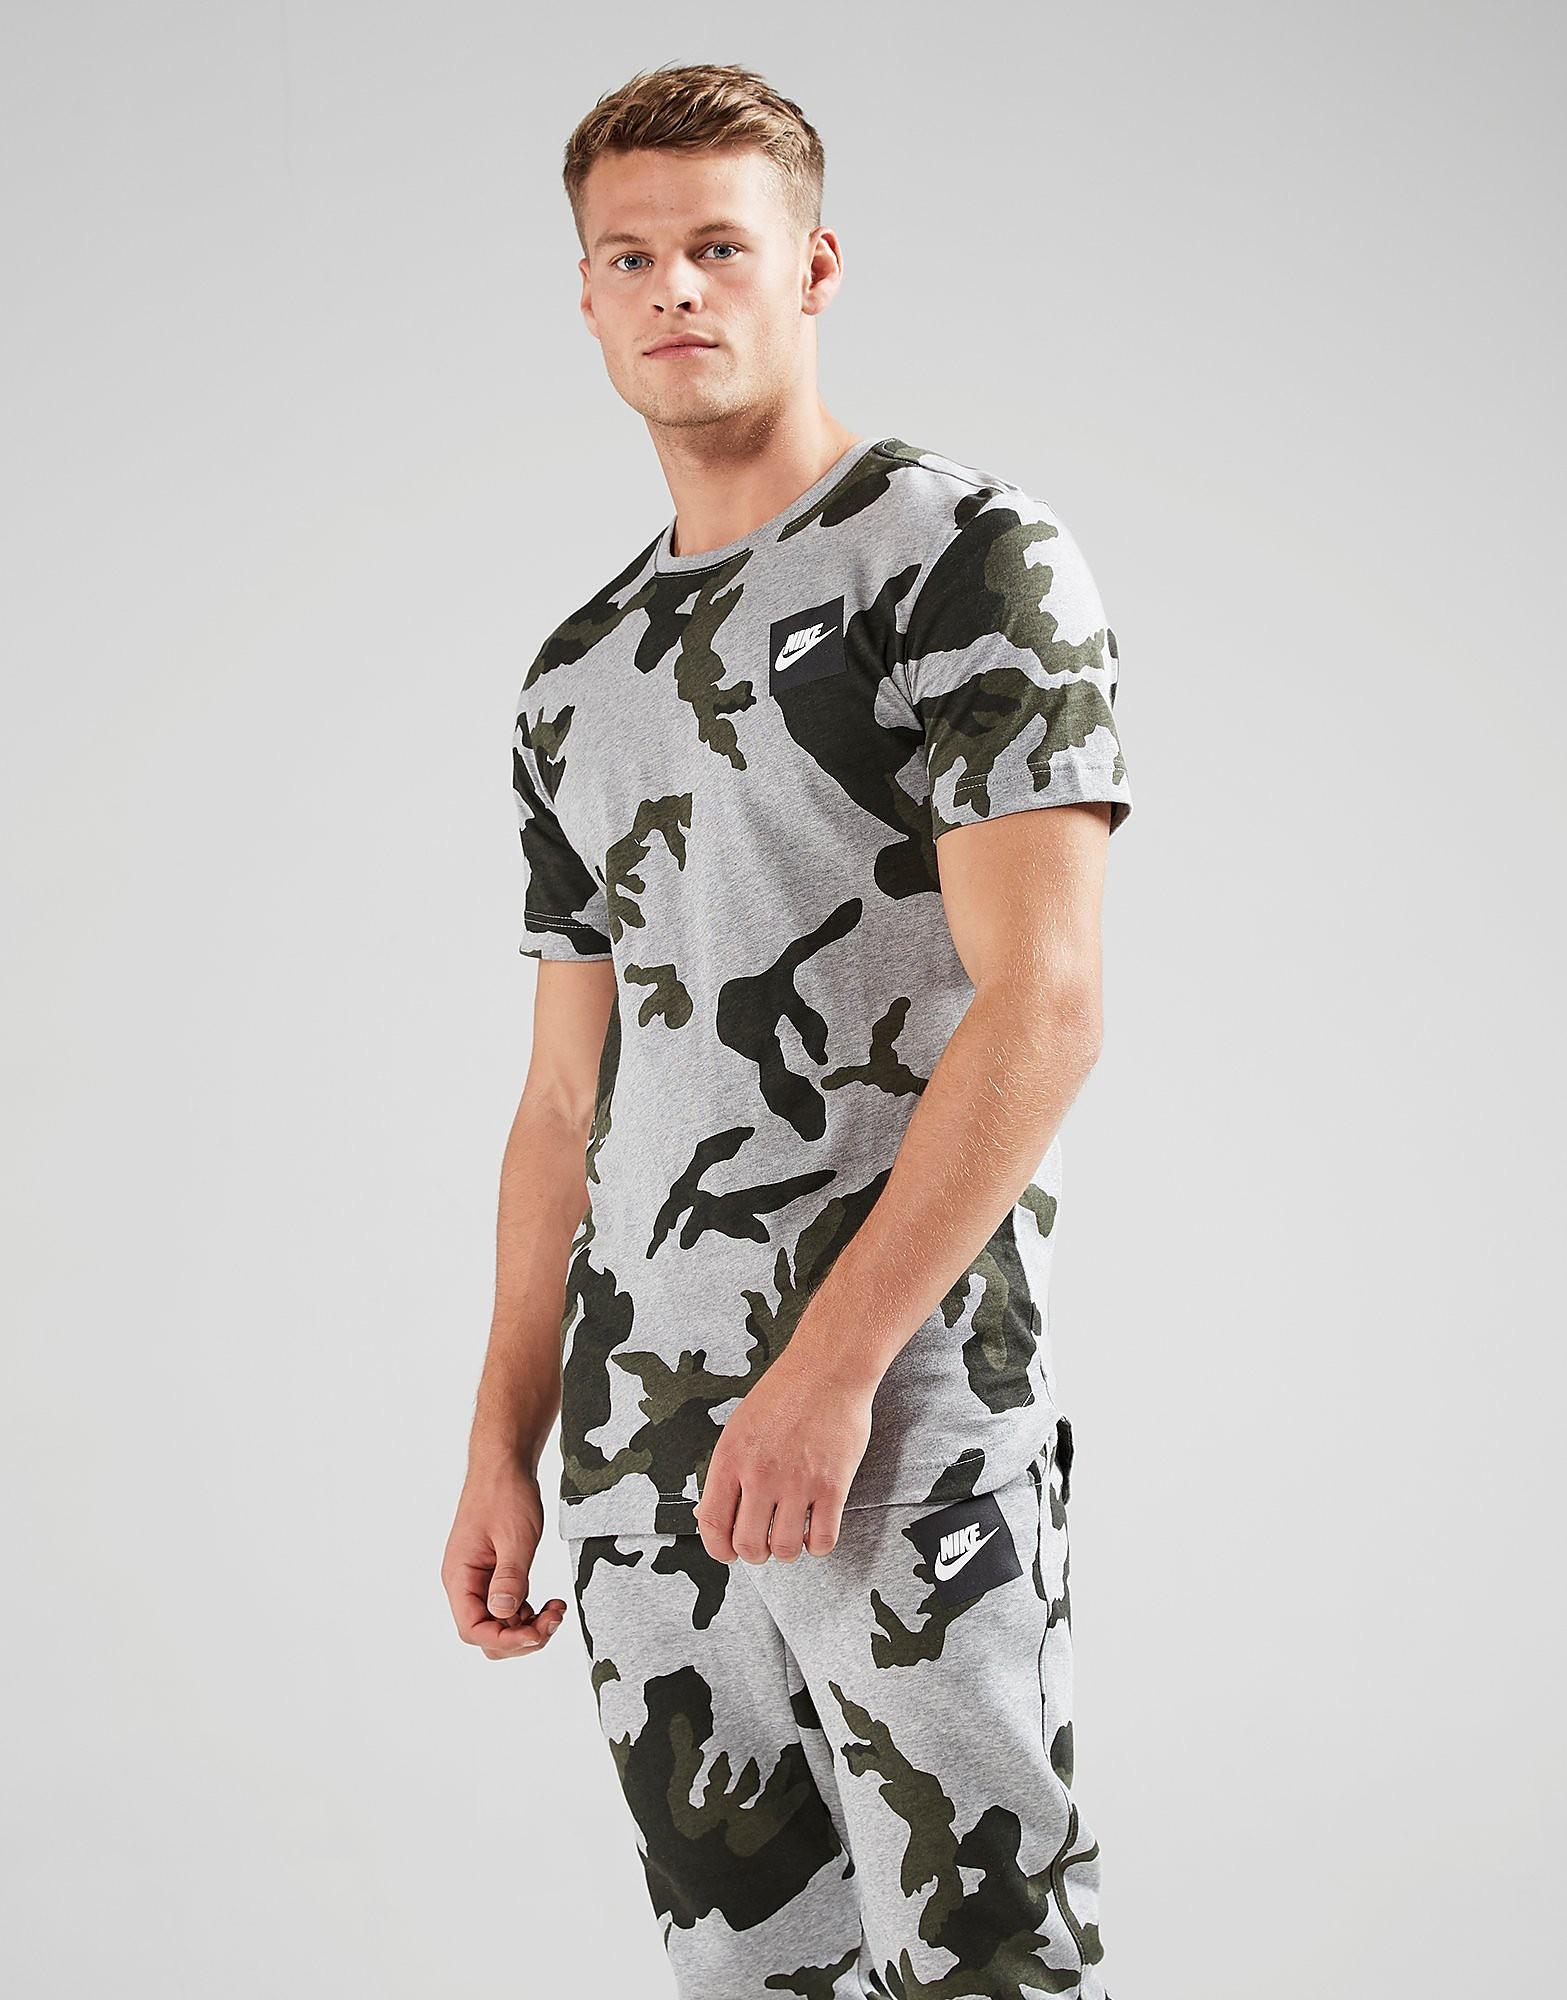 Nike Tarn AOP T-Shirt